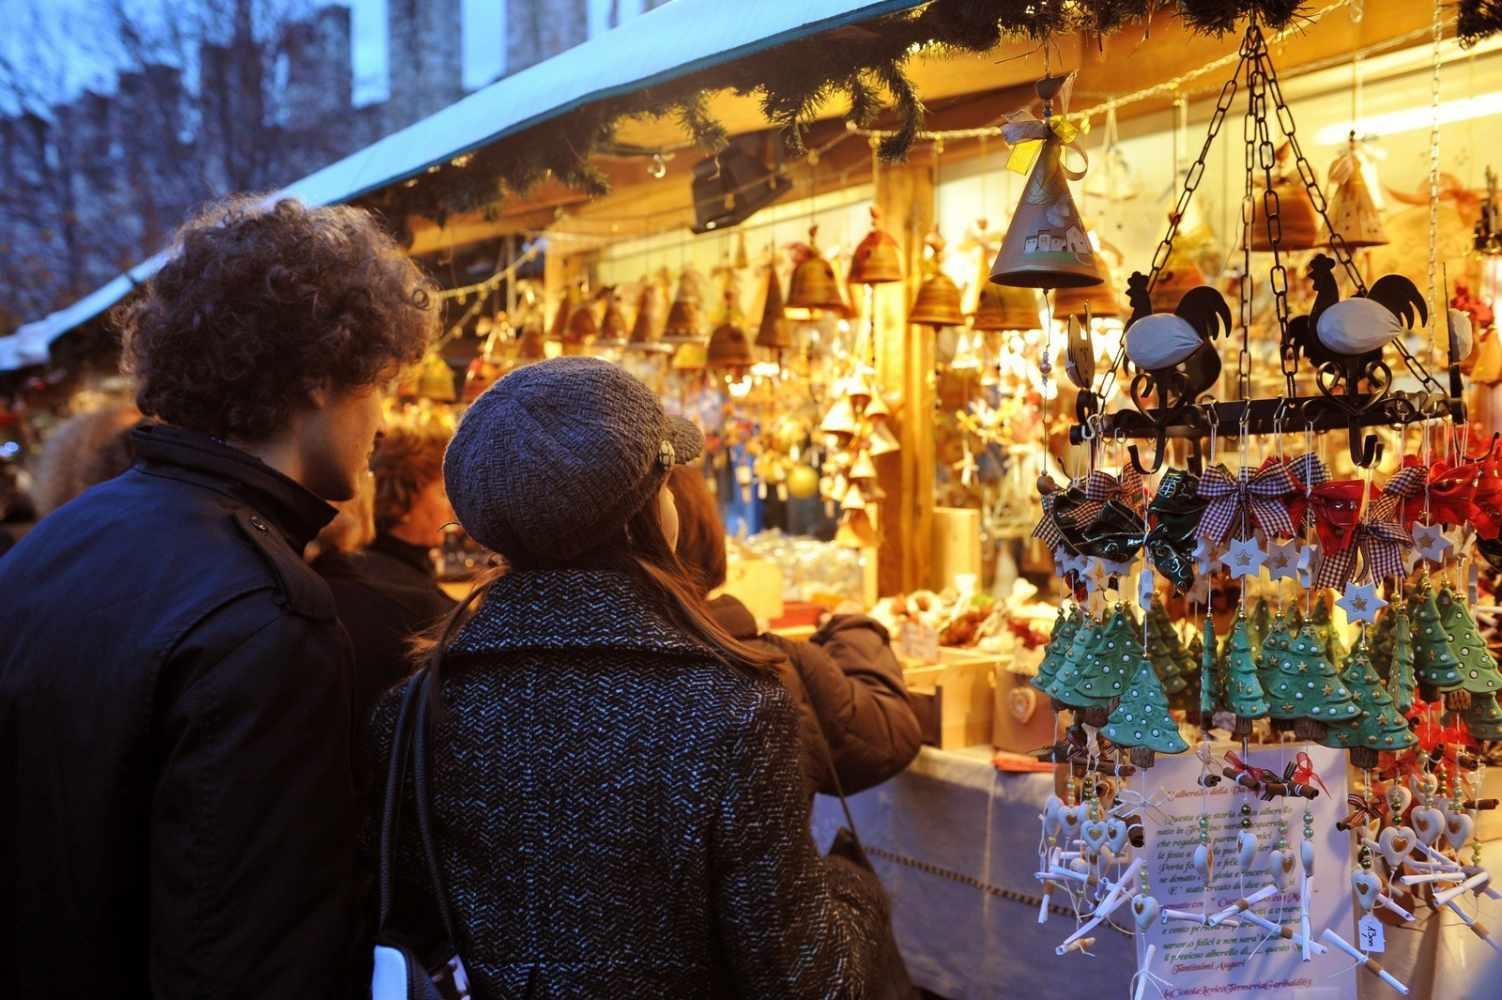 Casette Mercatino di Natale Trento foto M. Rensi - Mercatini di Natale: 7 рождественских рынков Милана